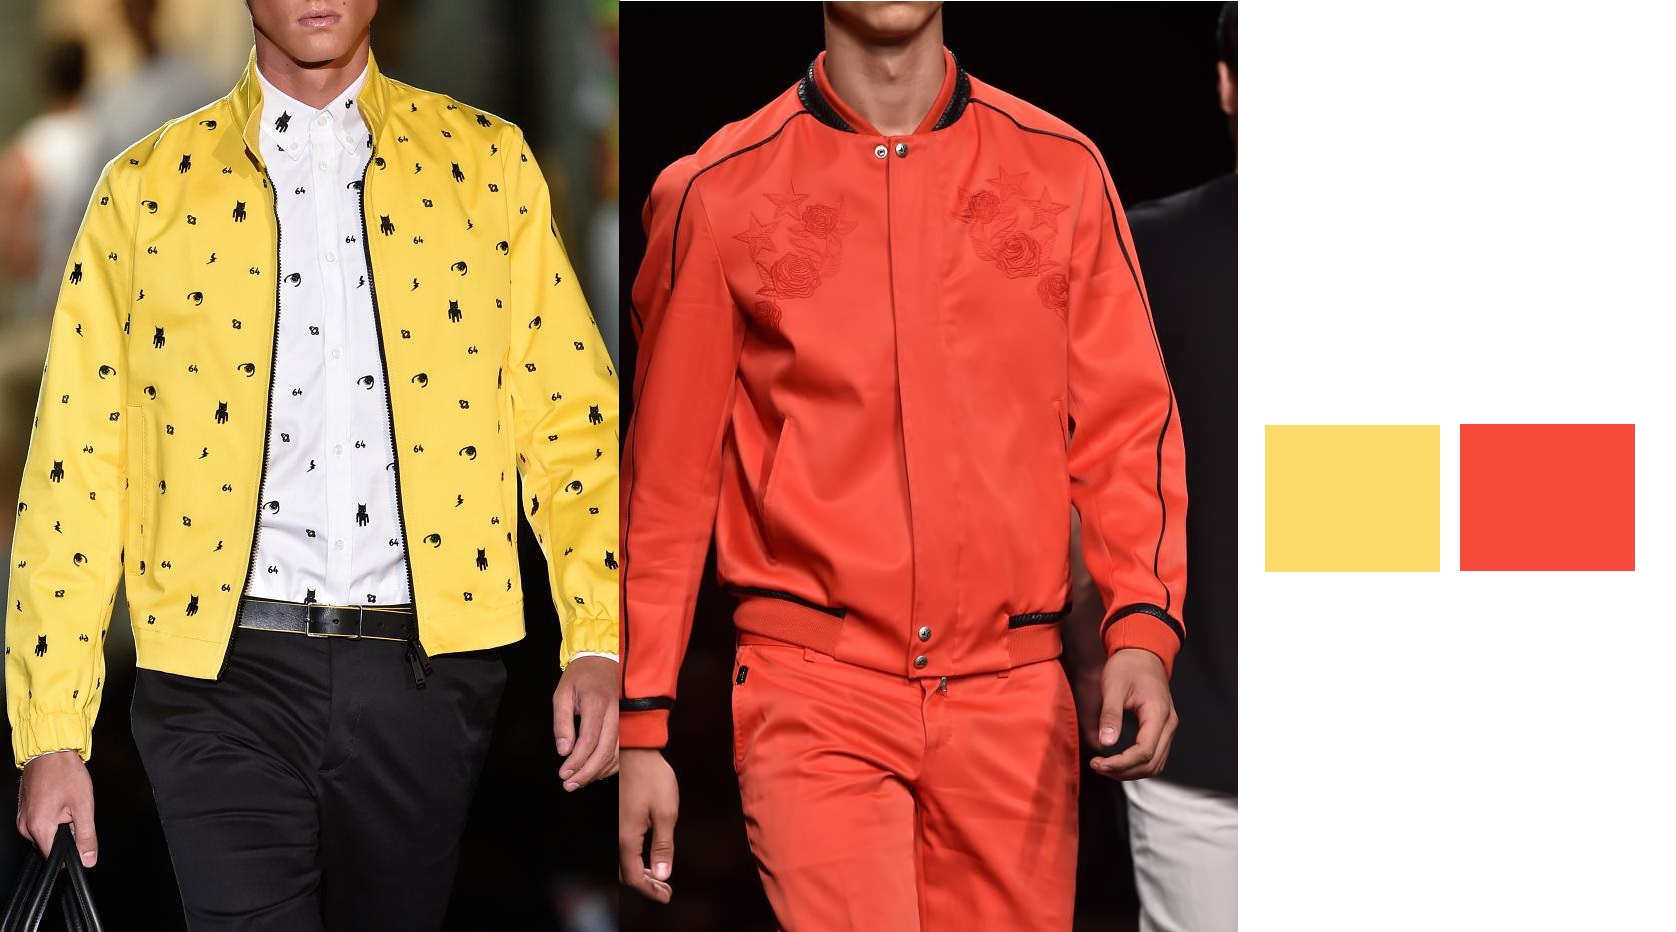 Milan, menswear, trends, personal shopper, image consultant, silk gift milan, man, shopping, trendy, color palette for men